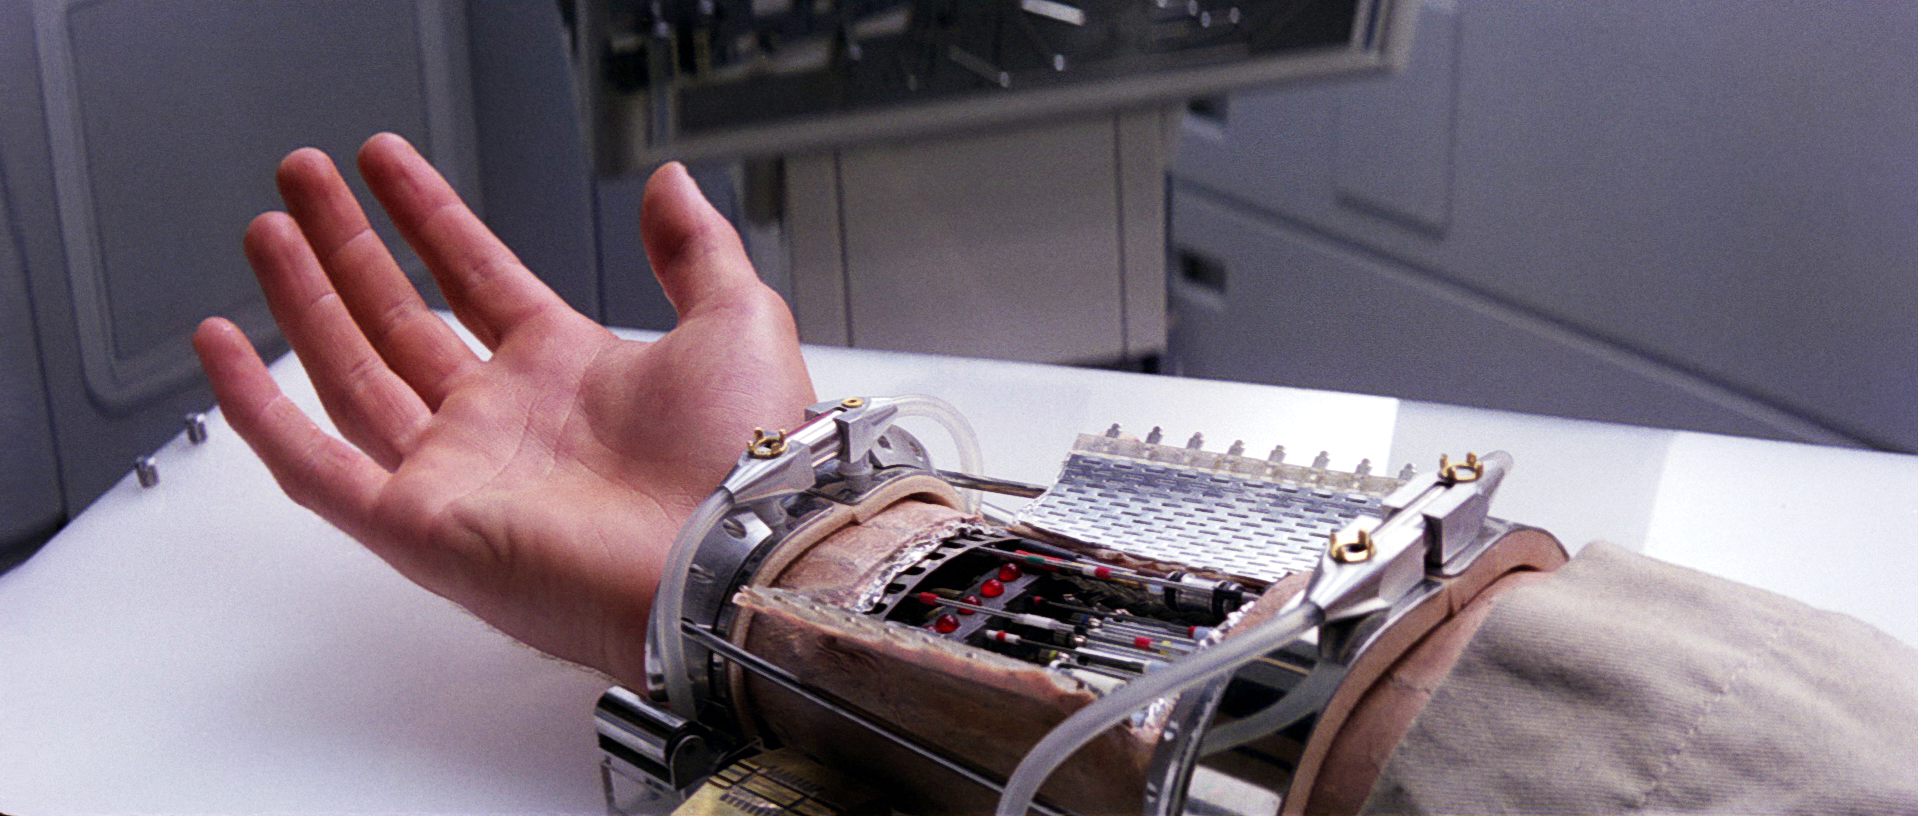 Luke Skywalker's robotic hand, from Star Wars.